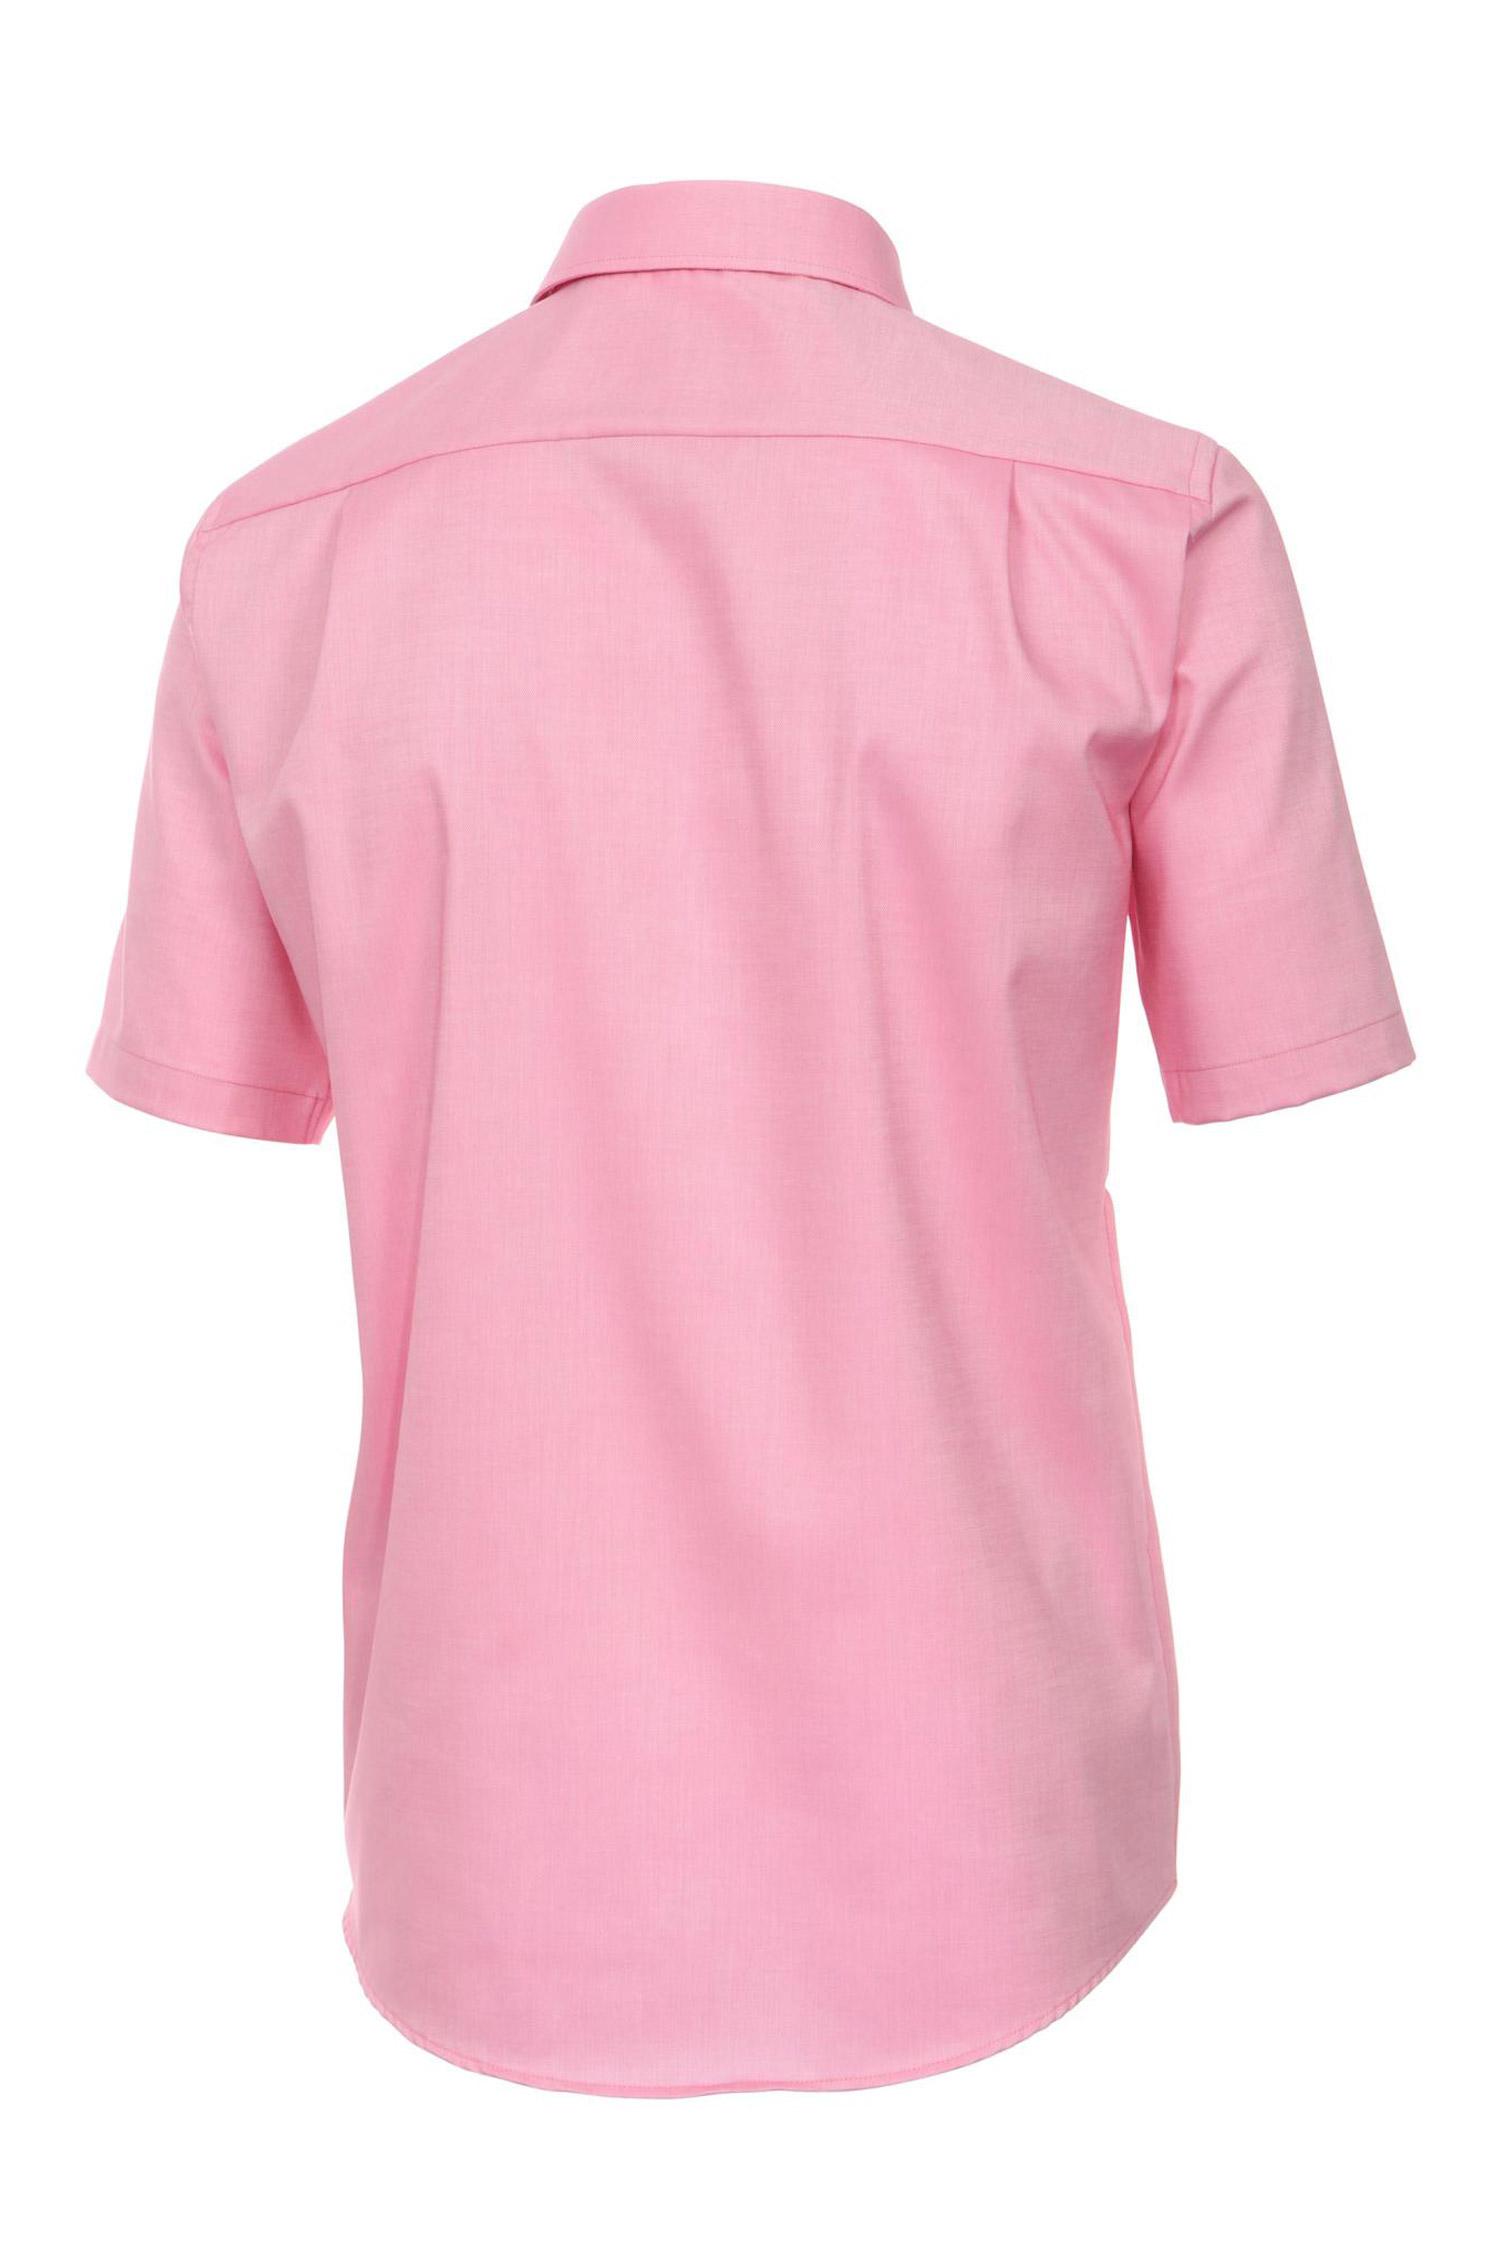 Camisas, Sport Manga Corta, 109292, ROSA | Zoom